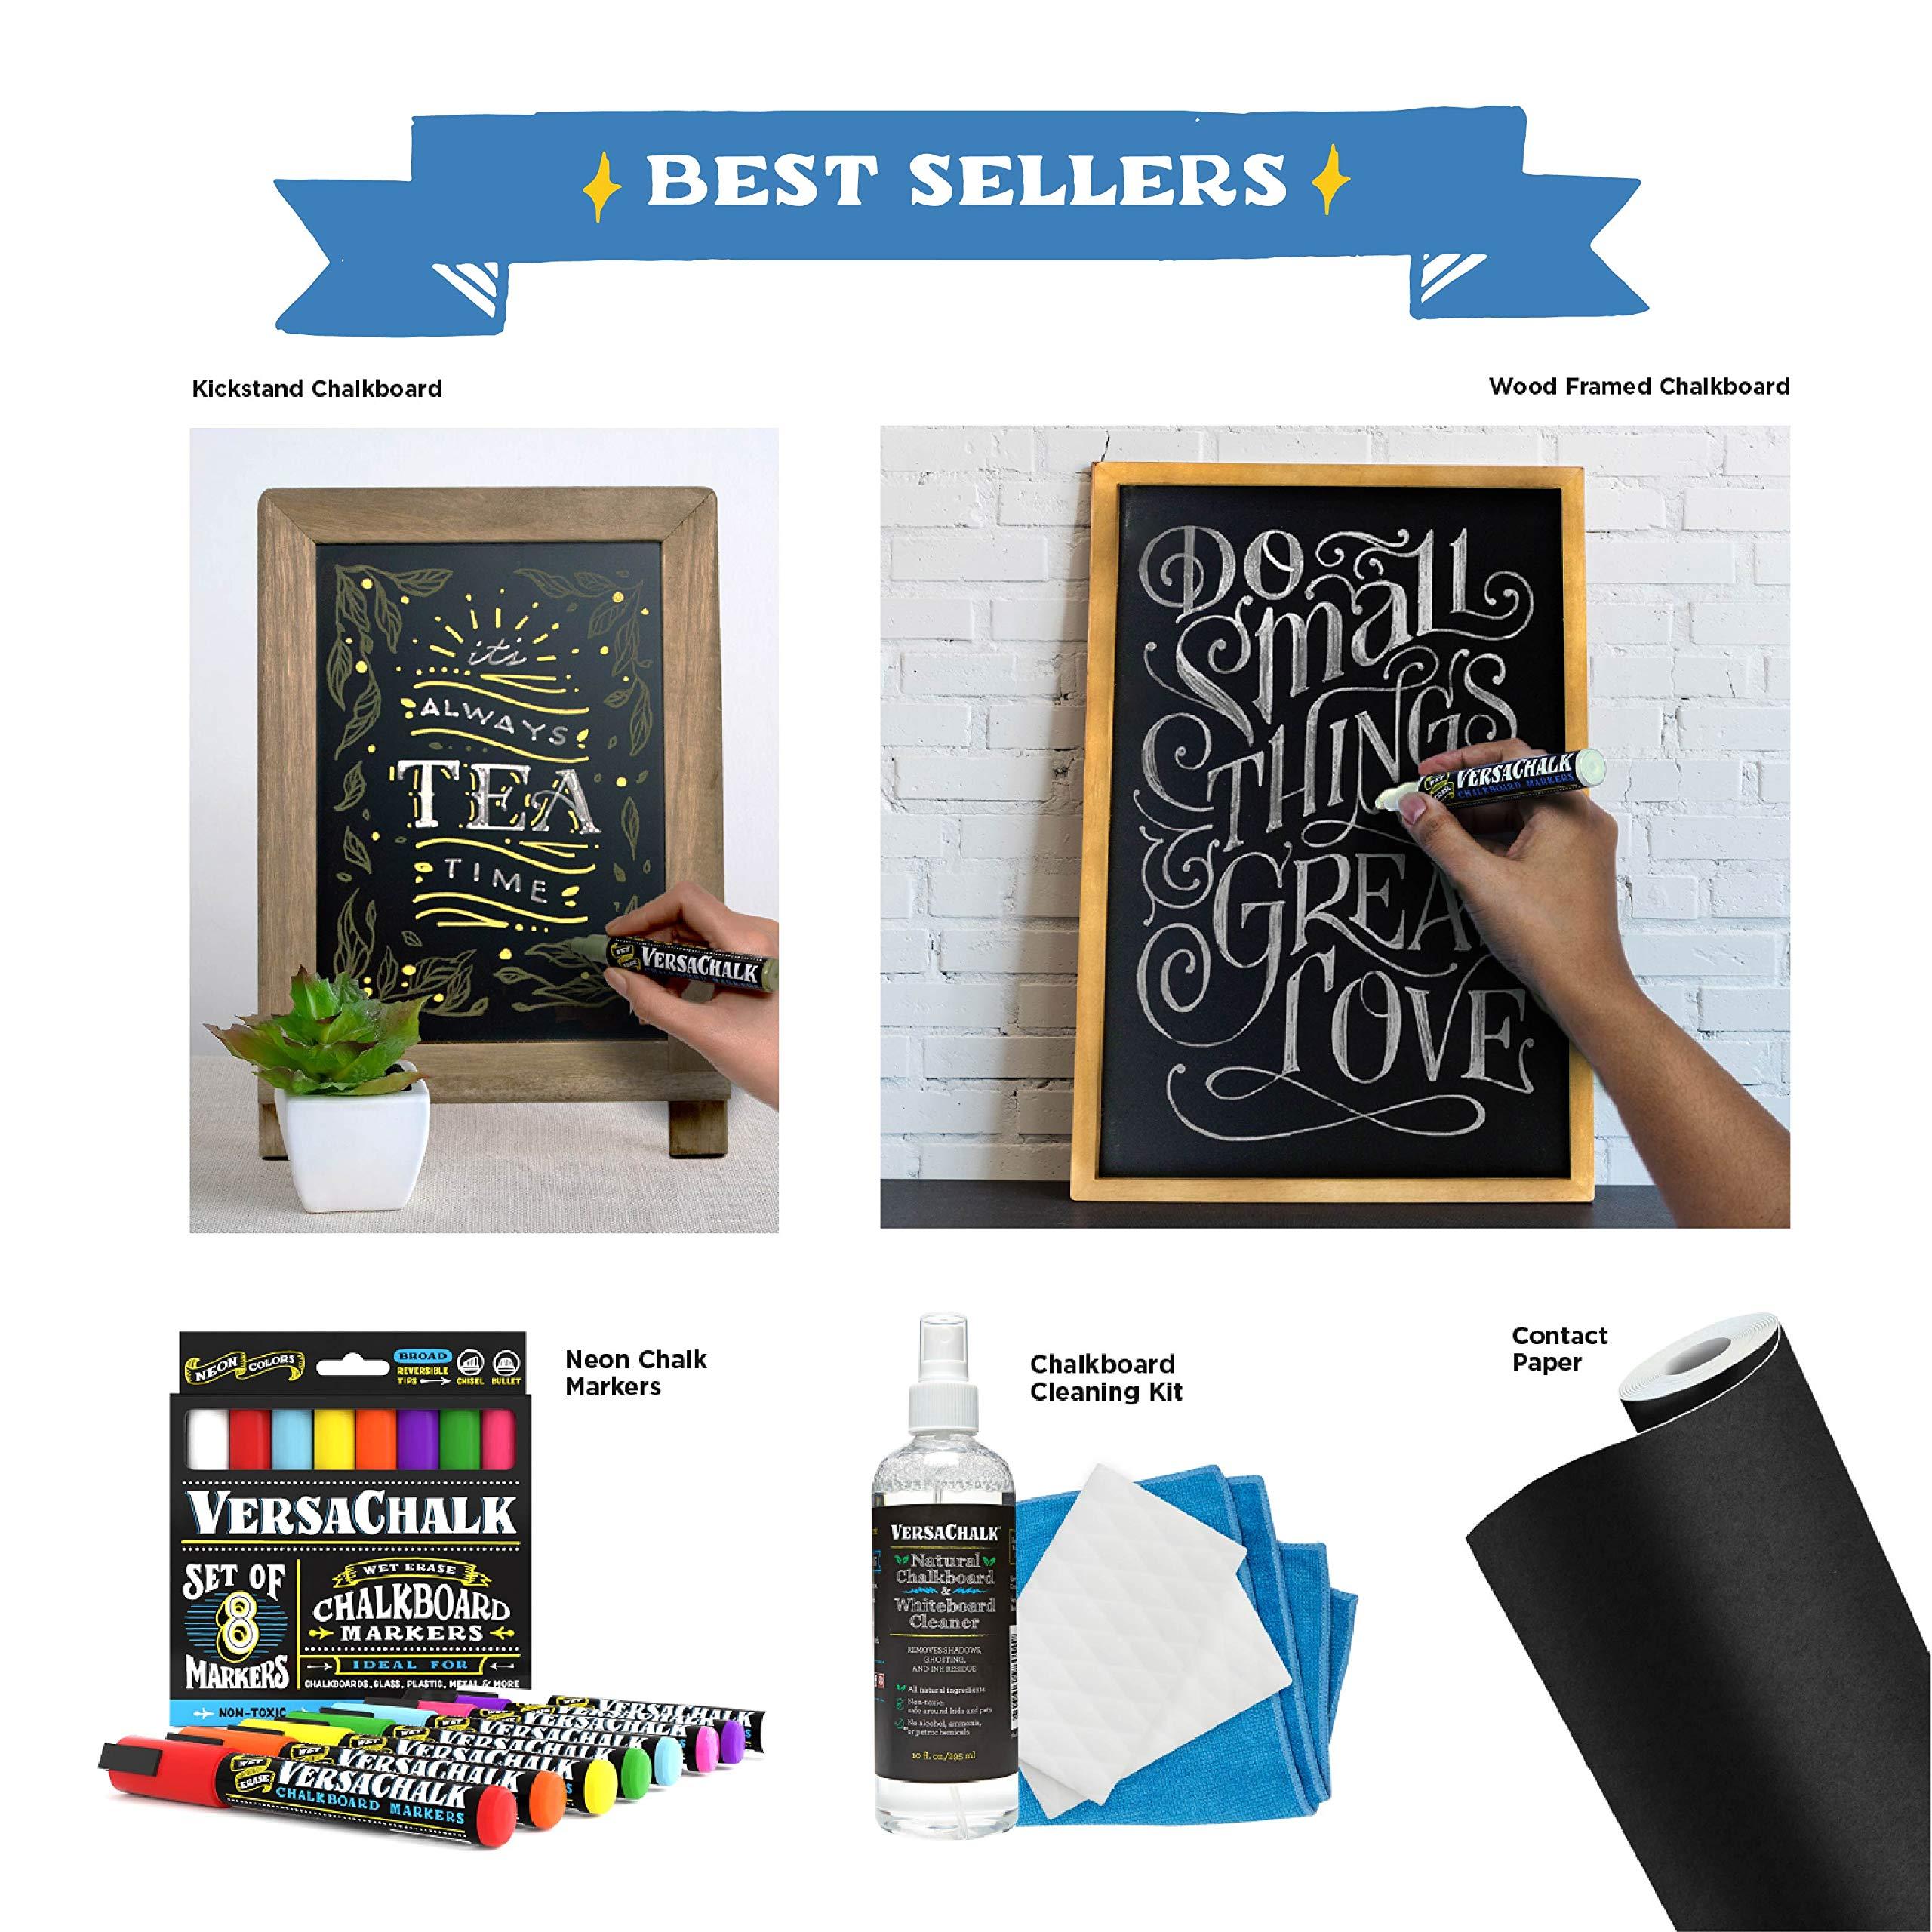 Metallic Liquid Chalk Marker Pens by VersaChalk (6mm Bold Chisel + Bullet Tip) – 8 Metallic Colors | Dust Free, Water-Based, Non-Toxic by VersaChalk (Image #7)